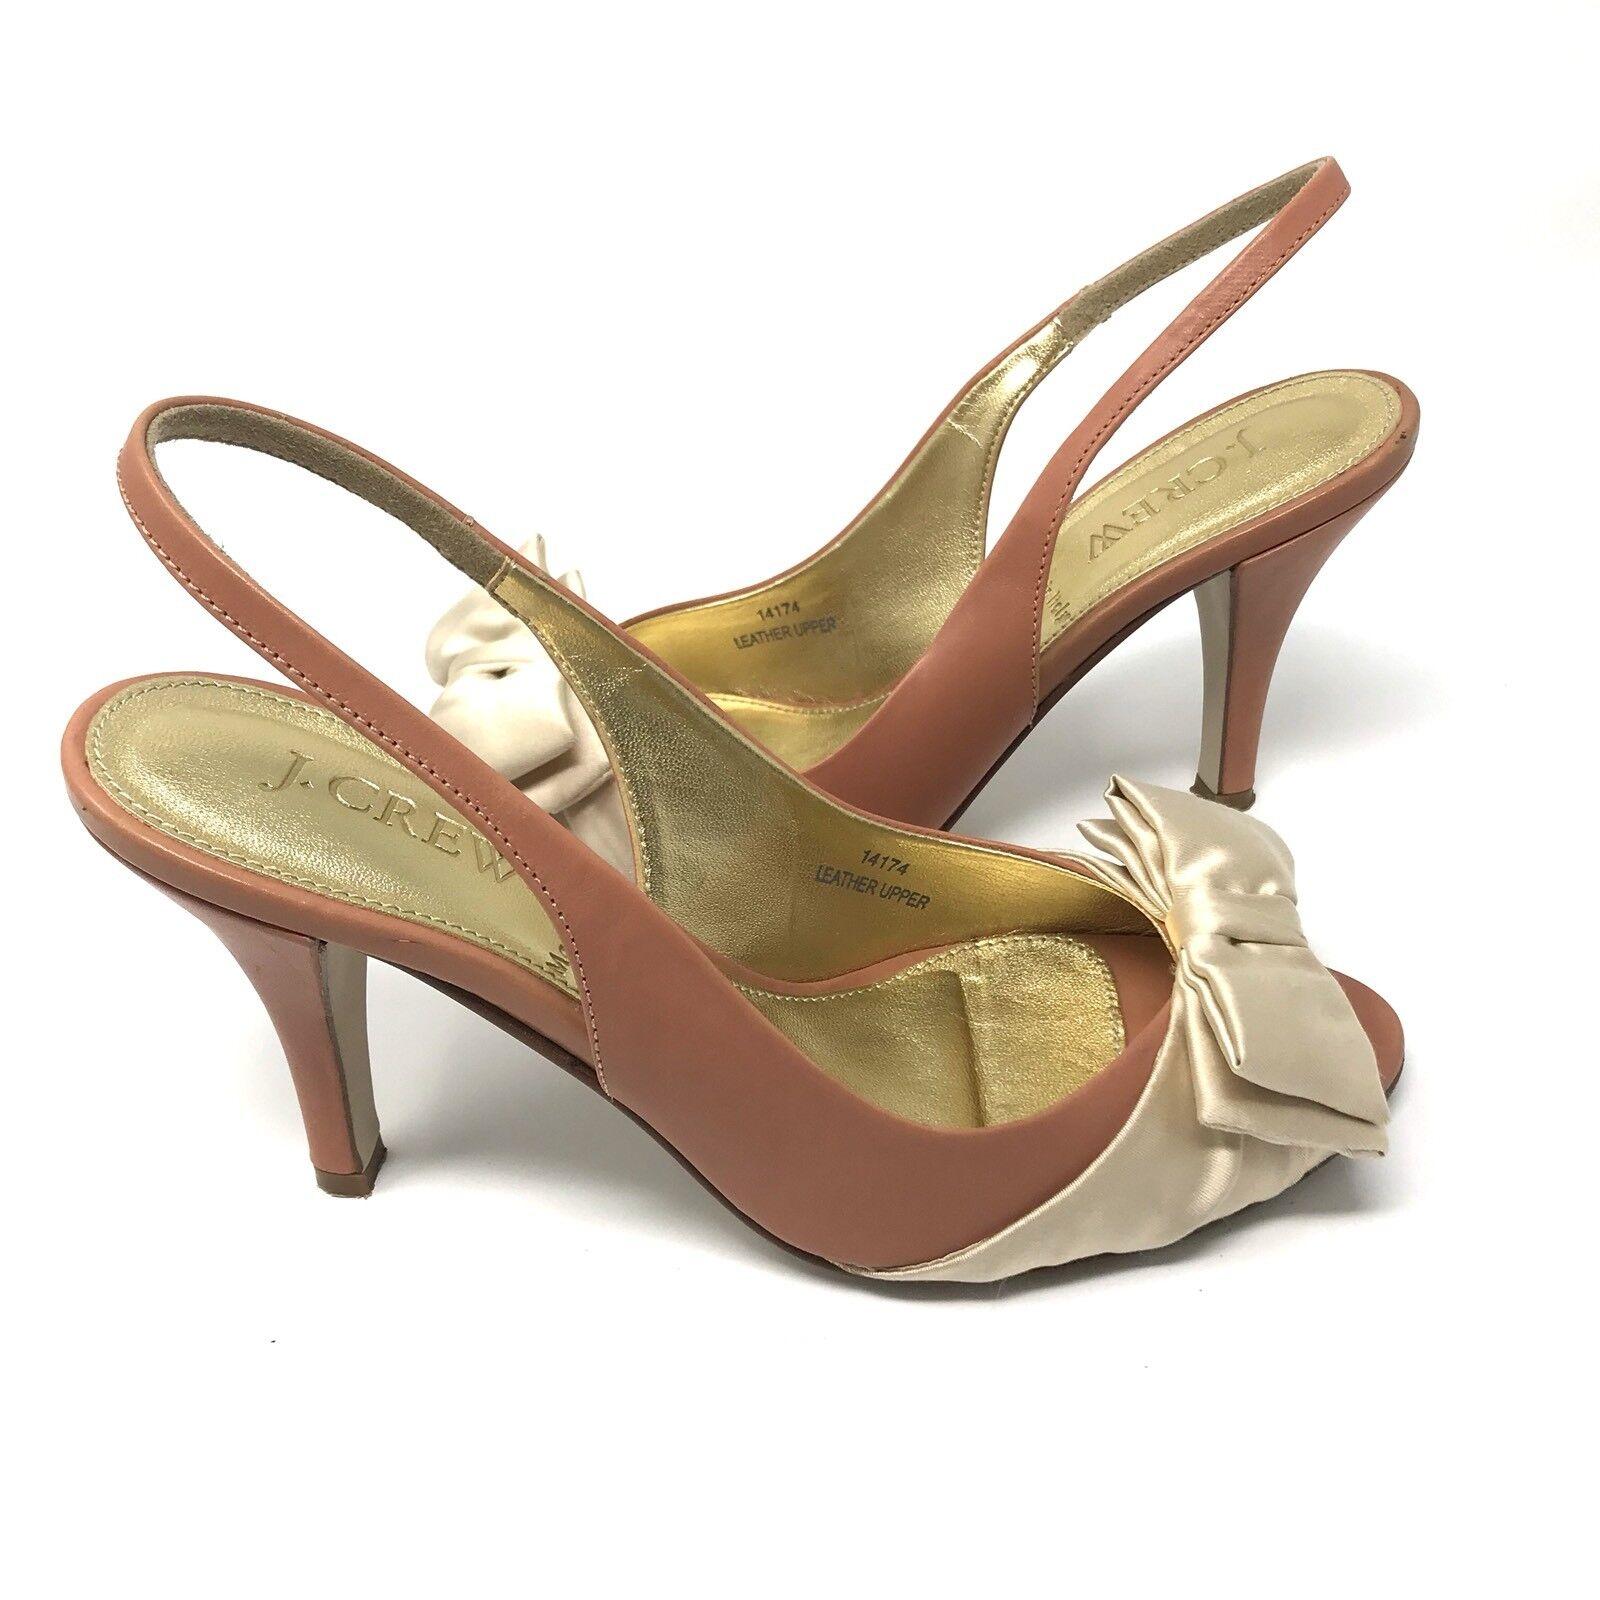 EUC Damenschuhe J. CREW 6 Soft Apricot Bowed Augusta Peep Toe Sling Back Heels 14174